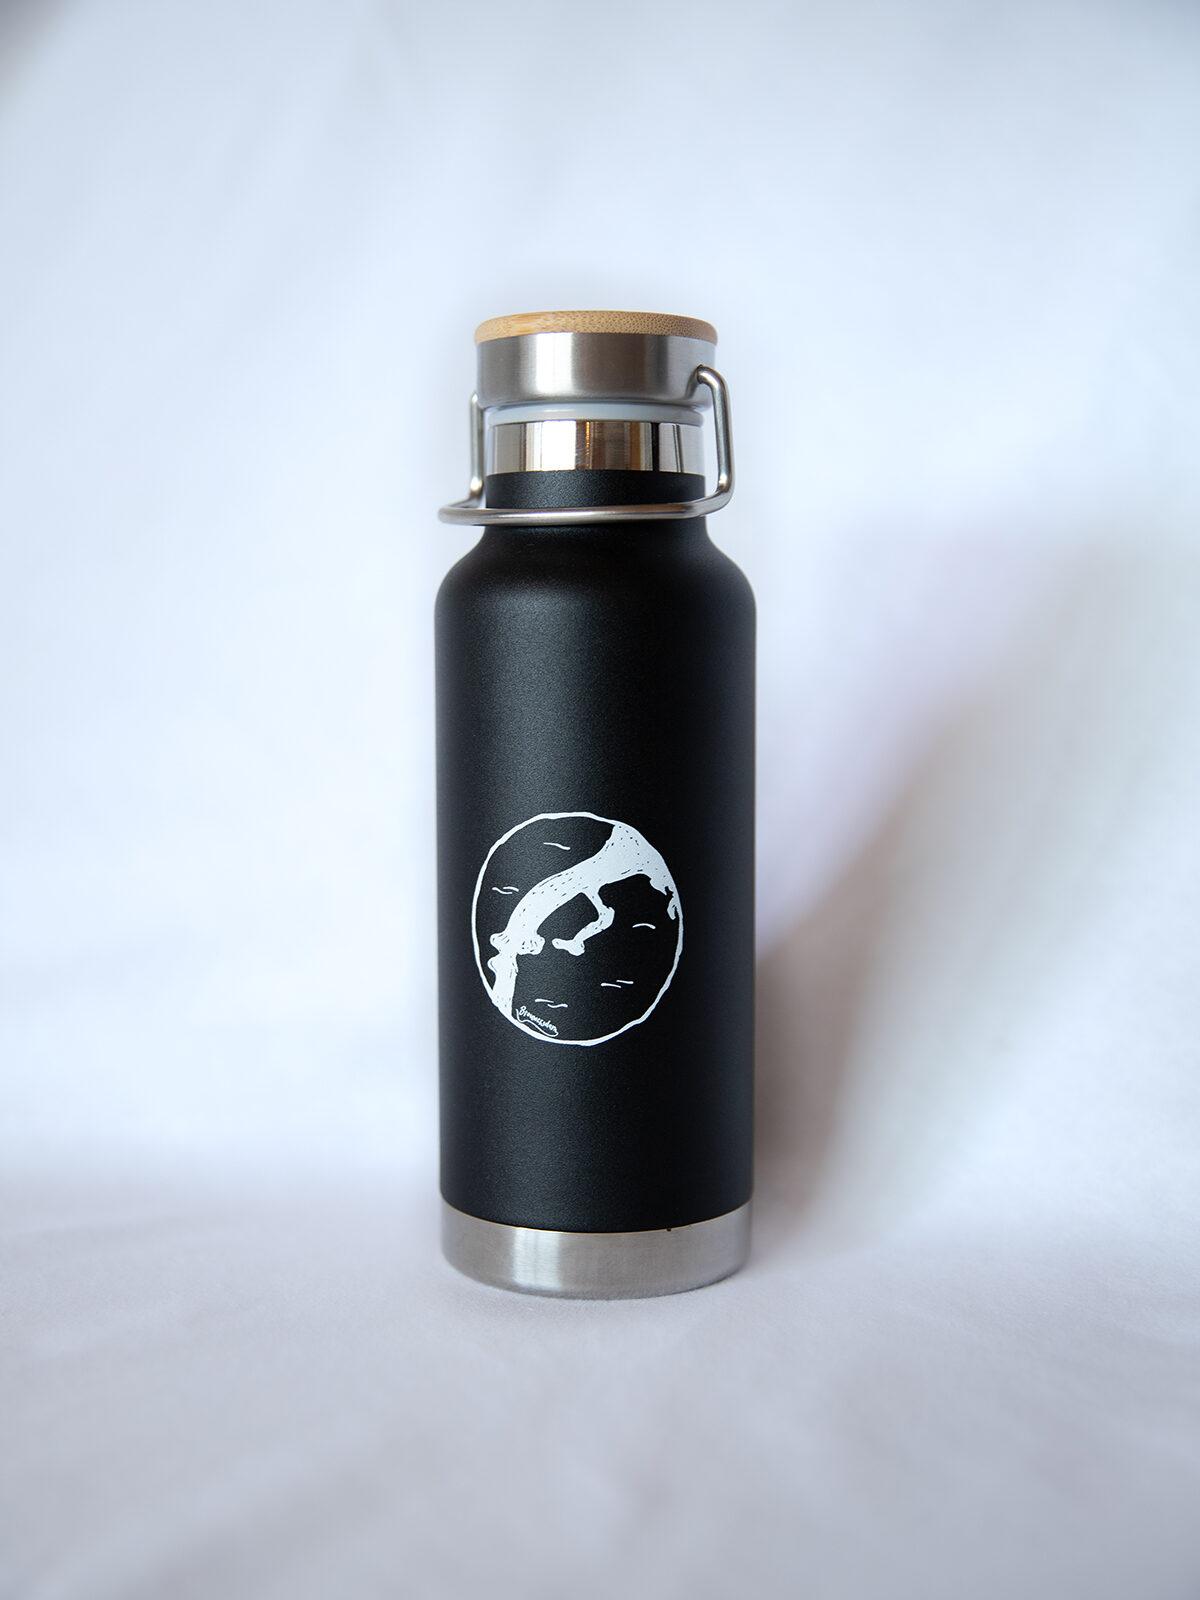 Visit Brouwersdam Bottle